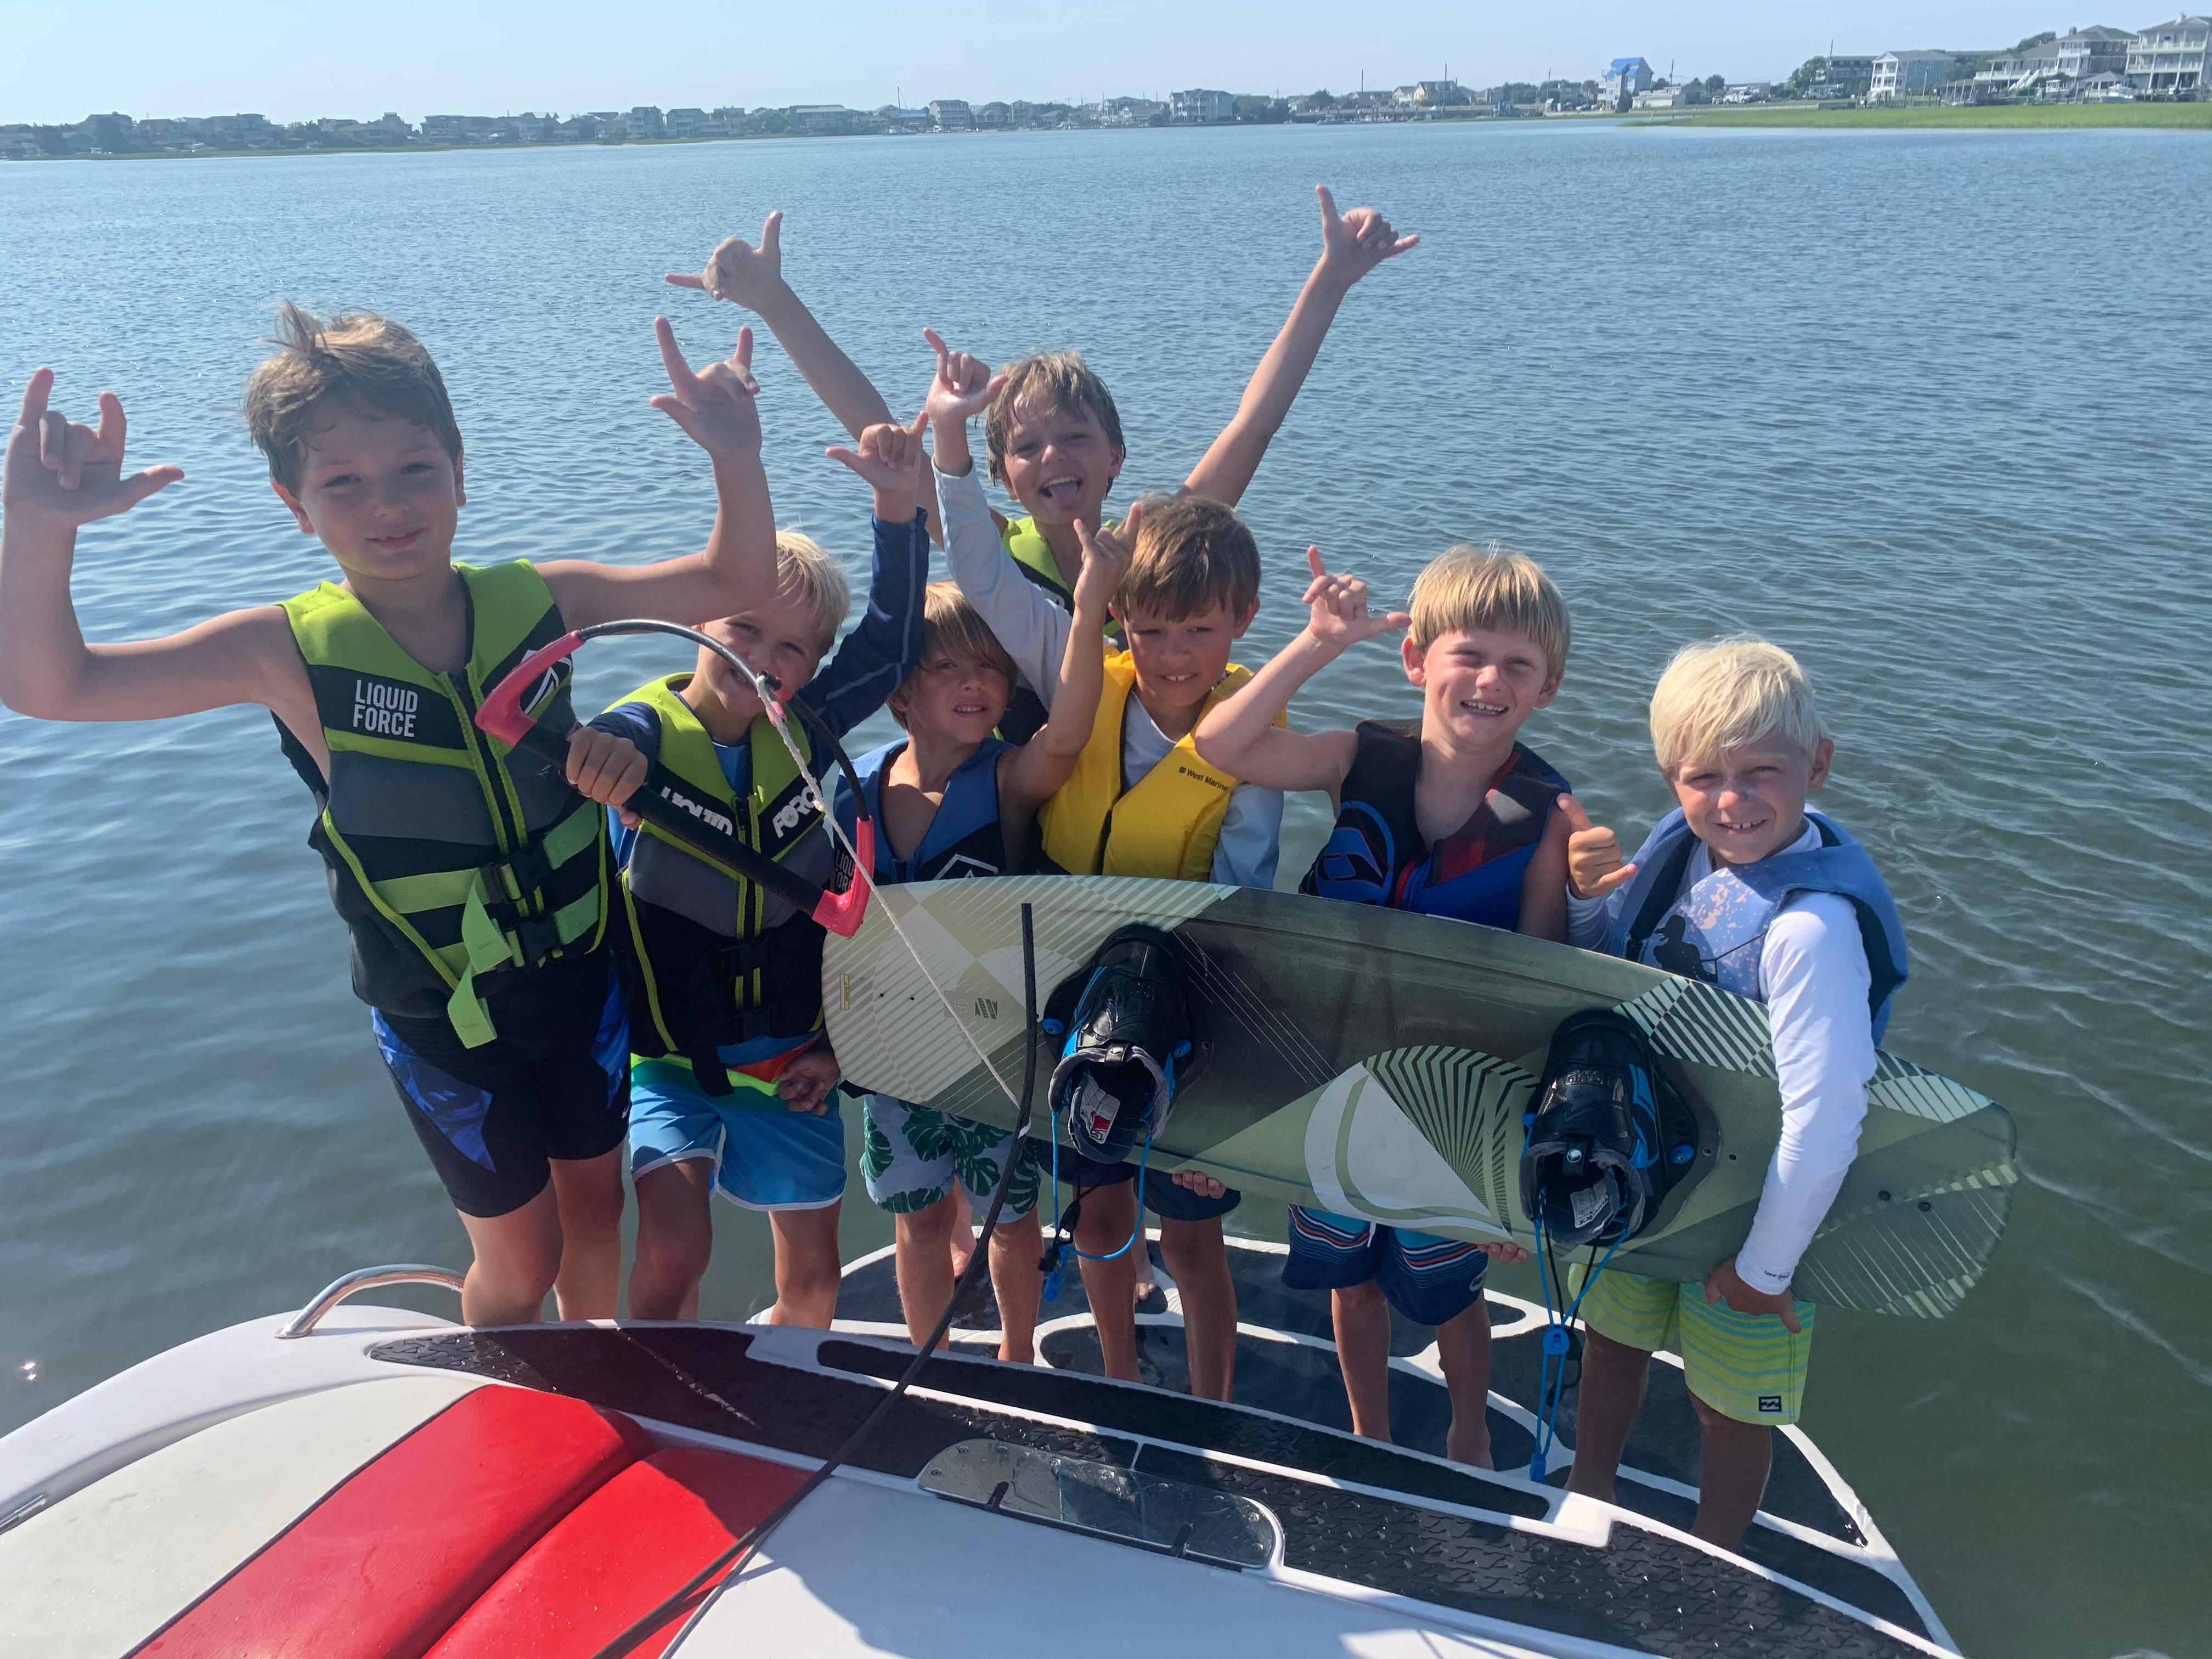 Kids Camp July 26-29